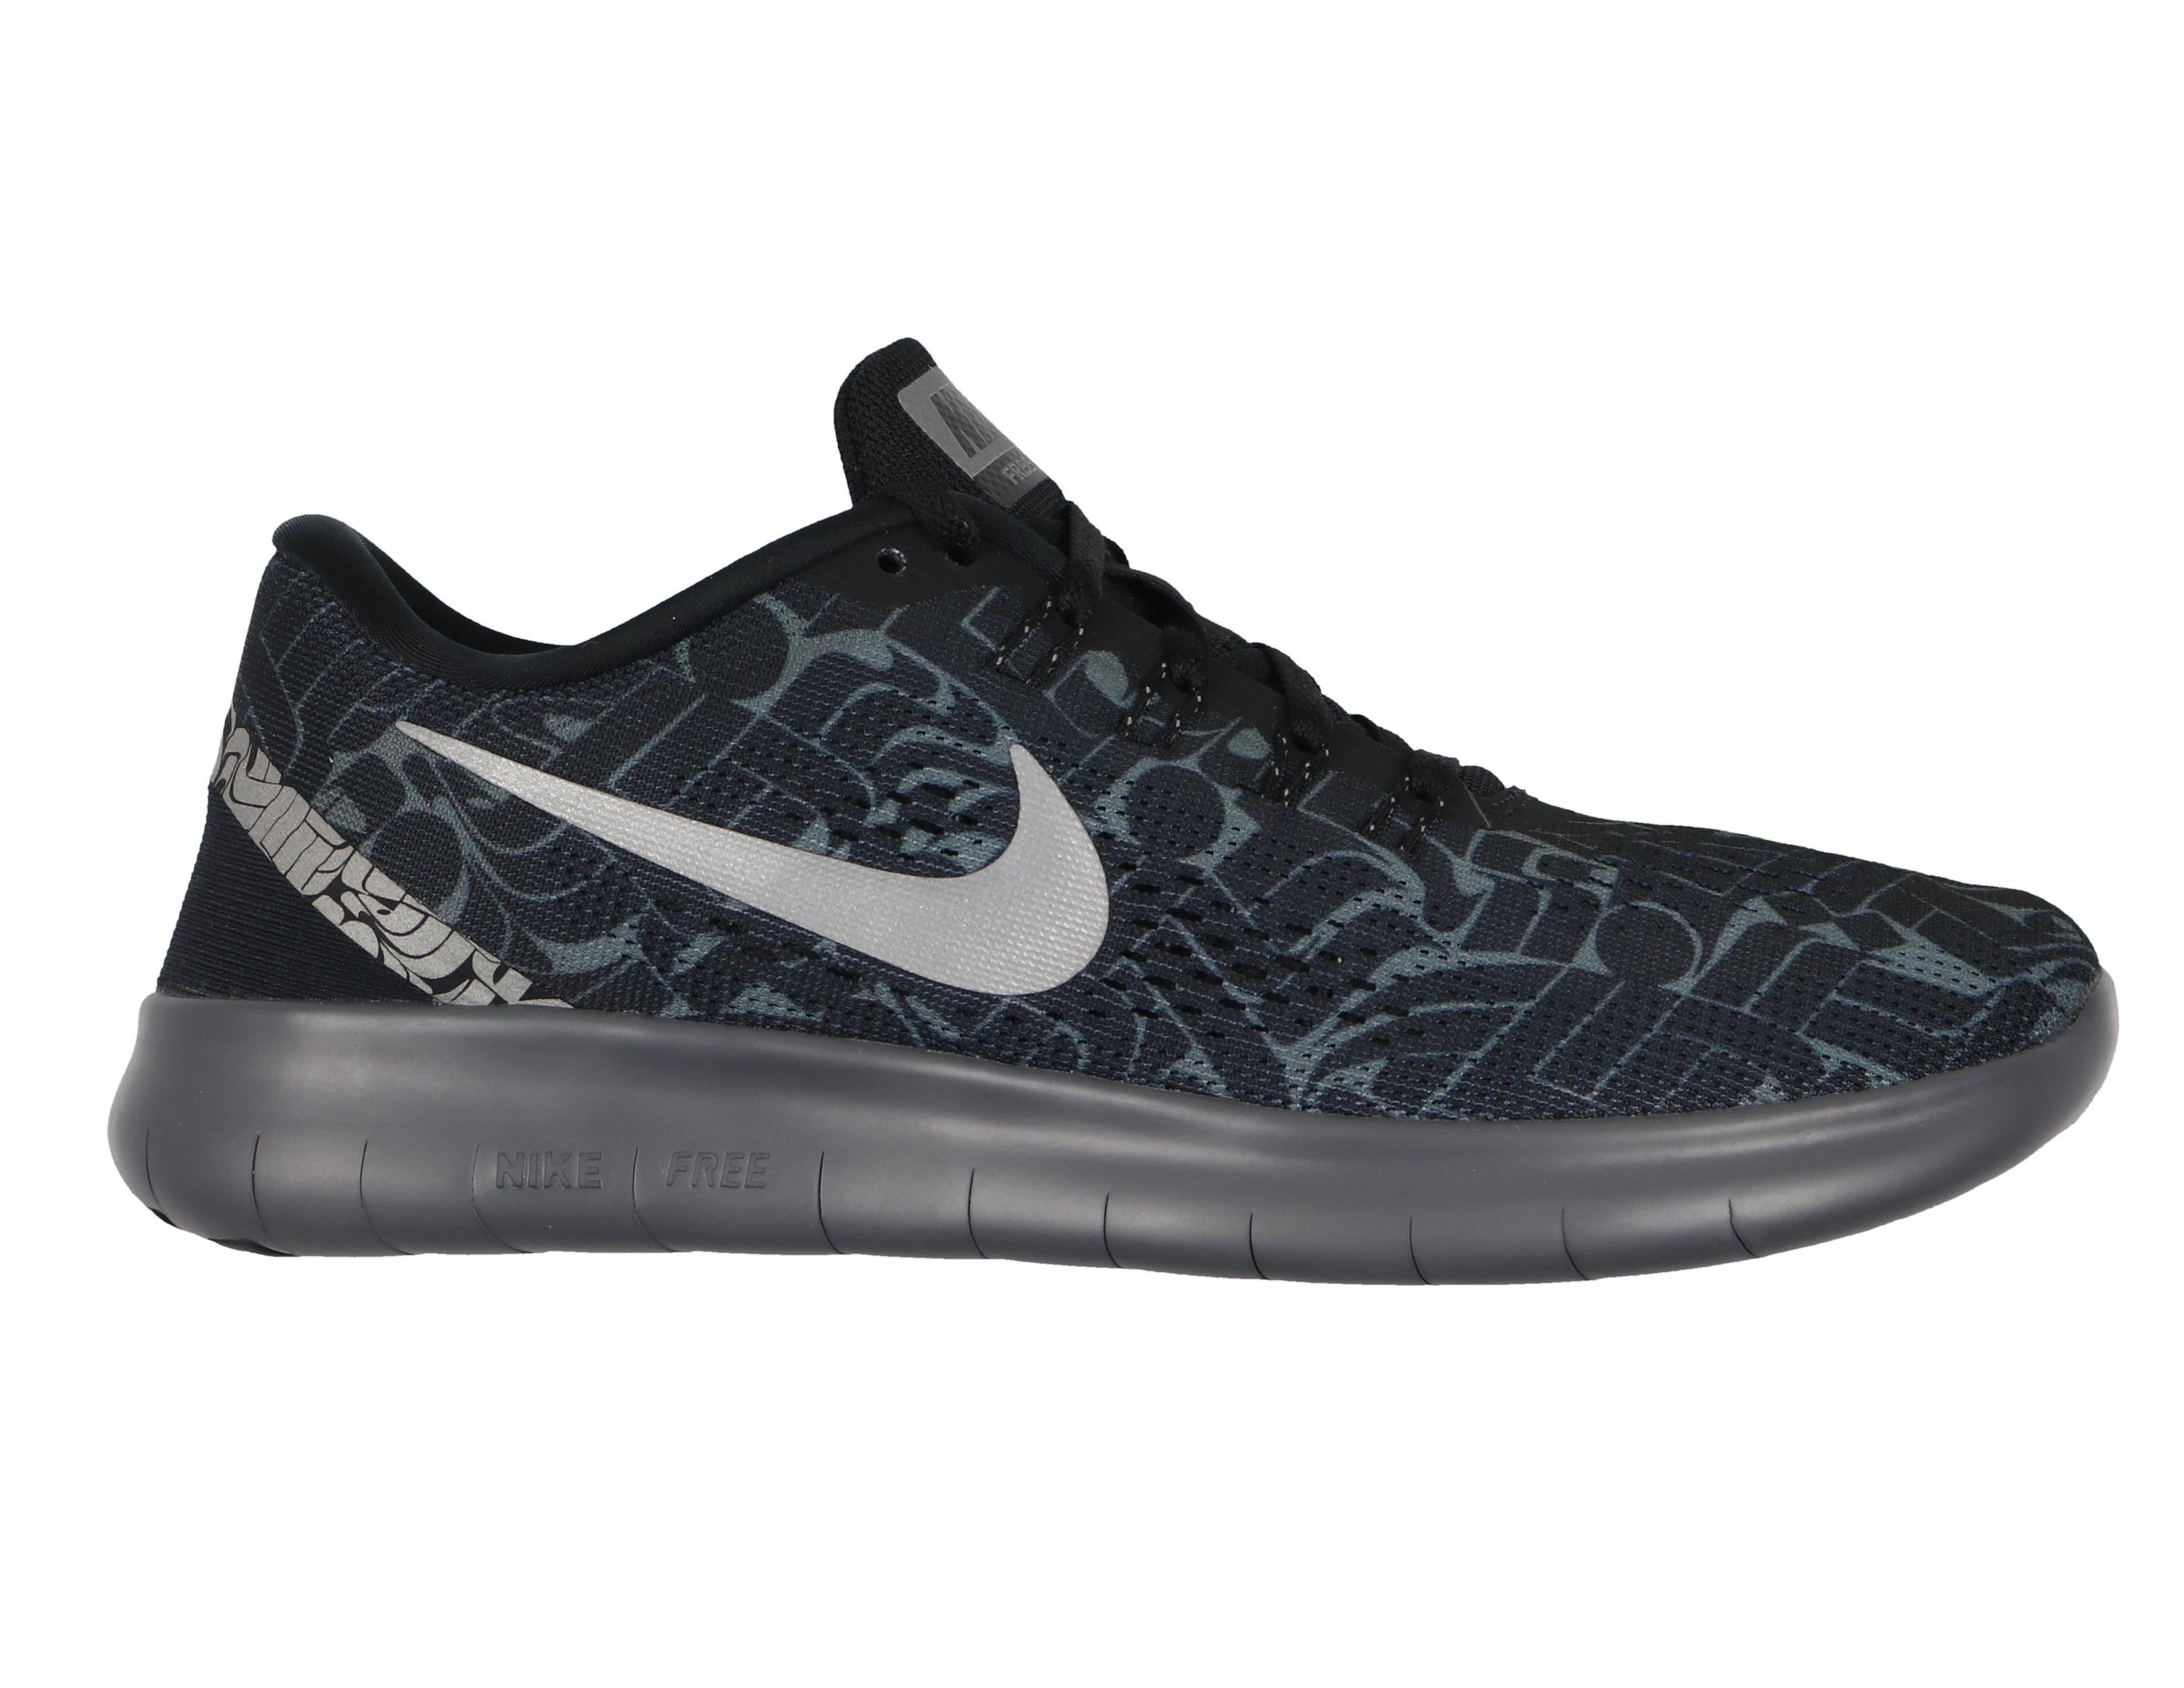 Nike Women's Free Run x Rostarr Gray Running Shoes Black Reflective Gray Rostarr 82a673